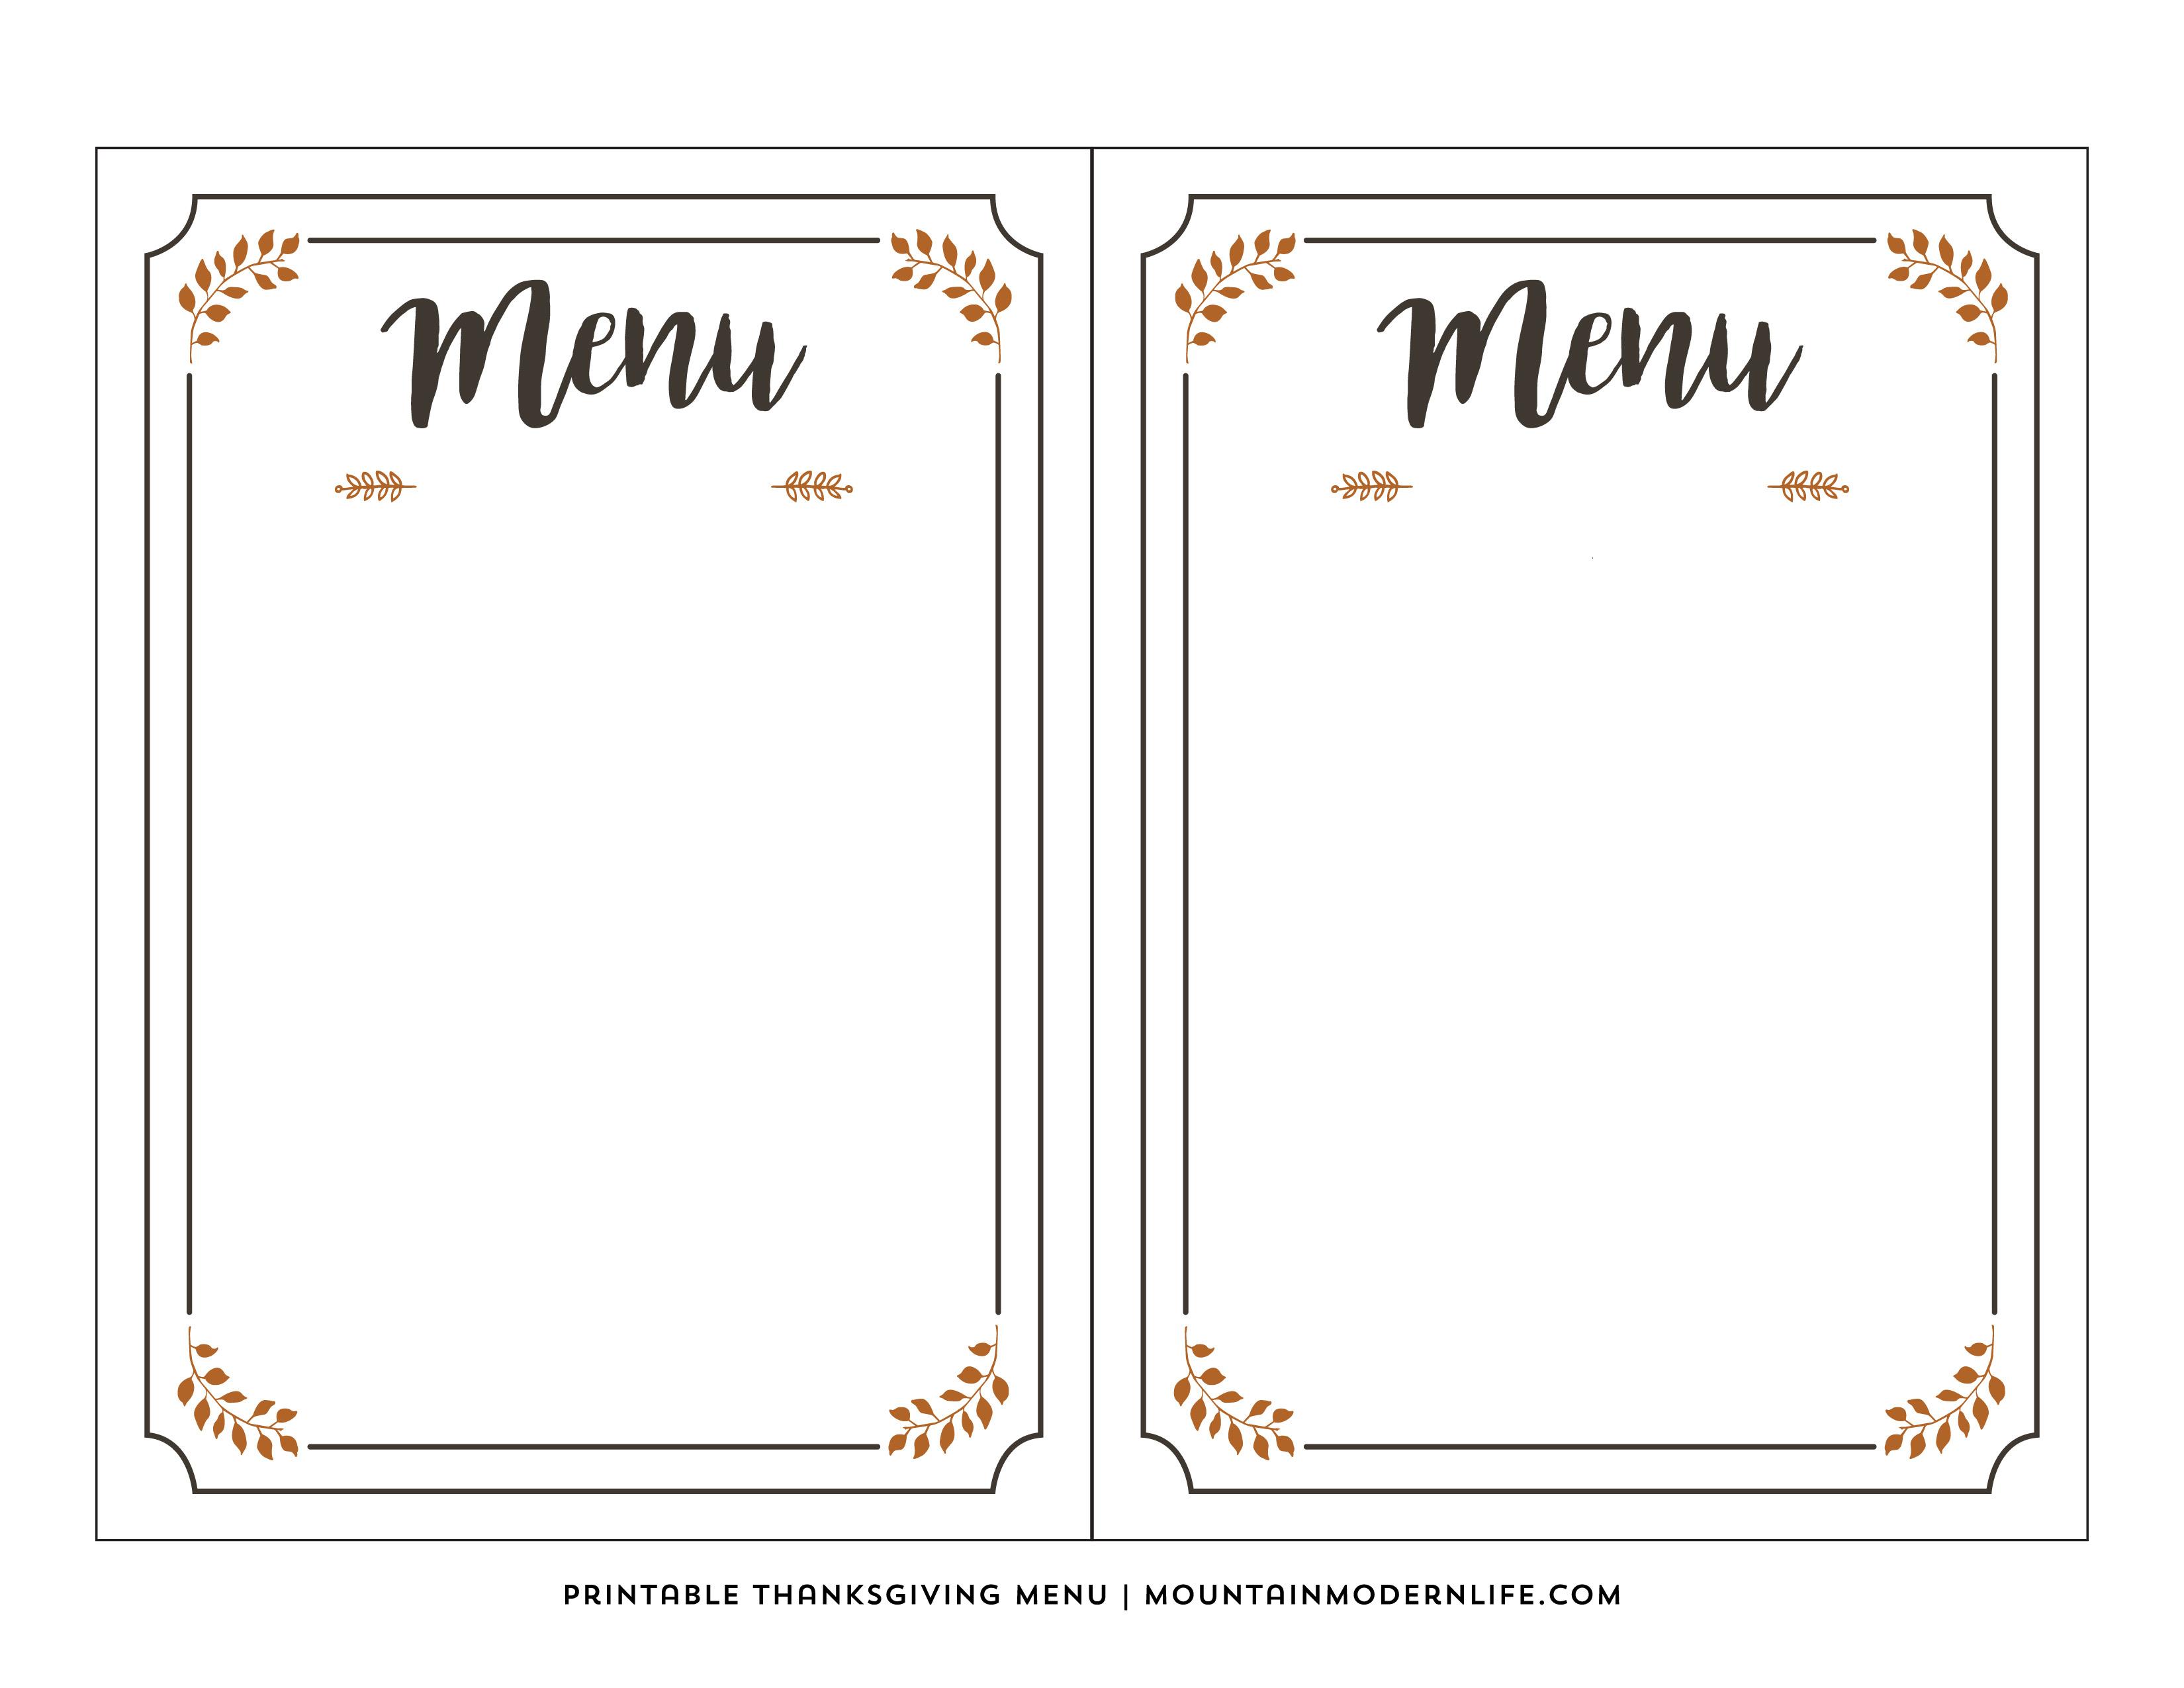 Free Printable Thanksgiving Menu | Mountainmodernlife - Free Printable Thanksgiving Menu Template